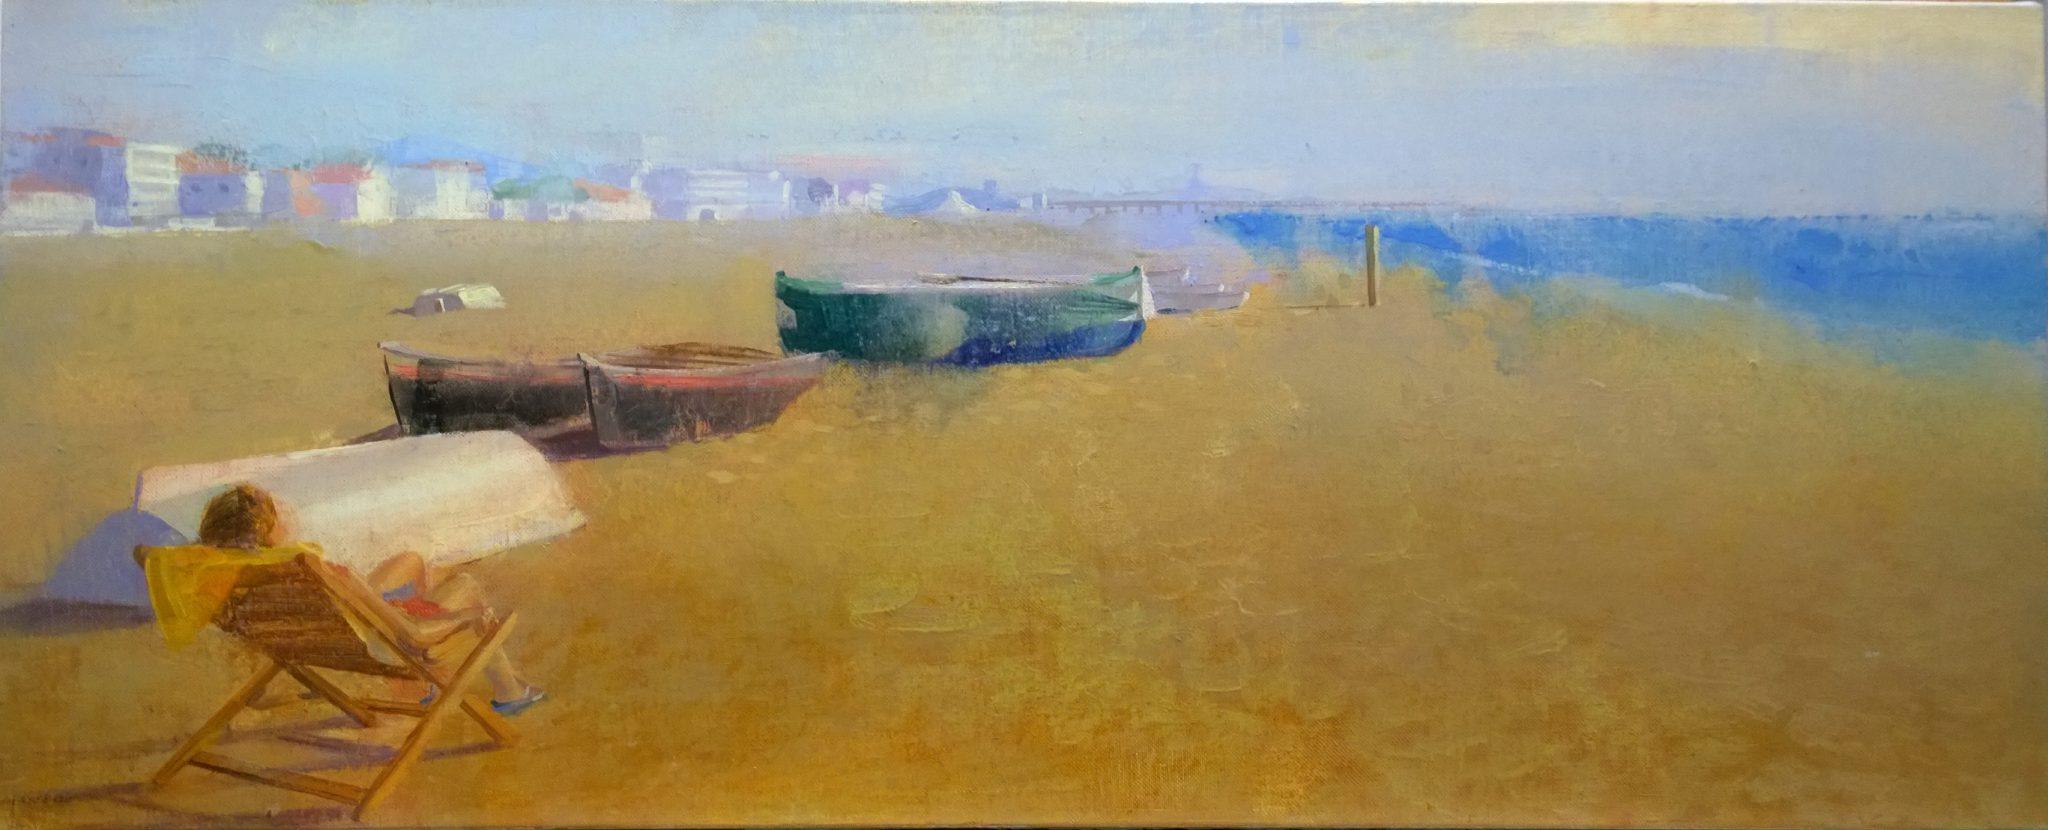 barcas-alejandra-caballero-oleo-barcas-playa-mar-mujer